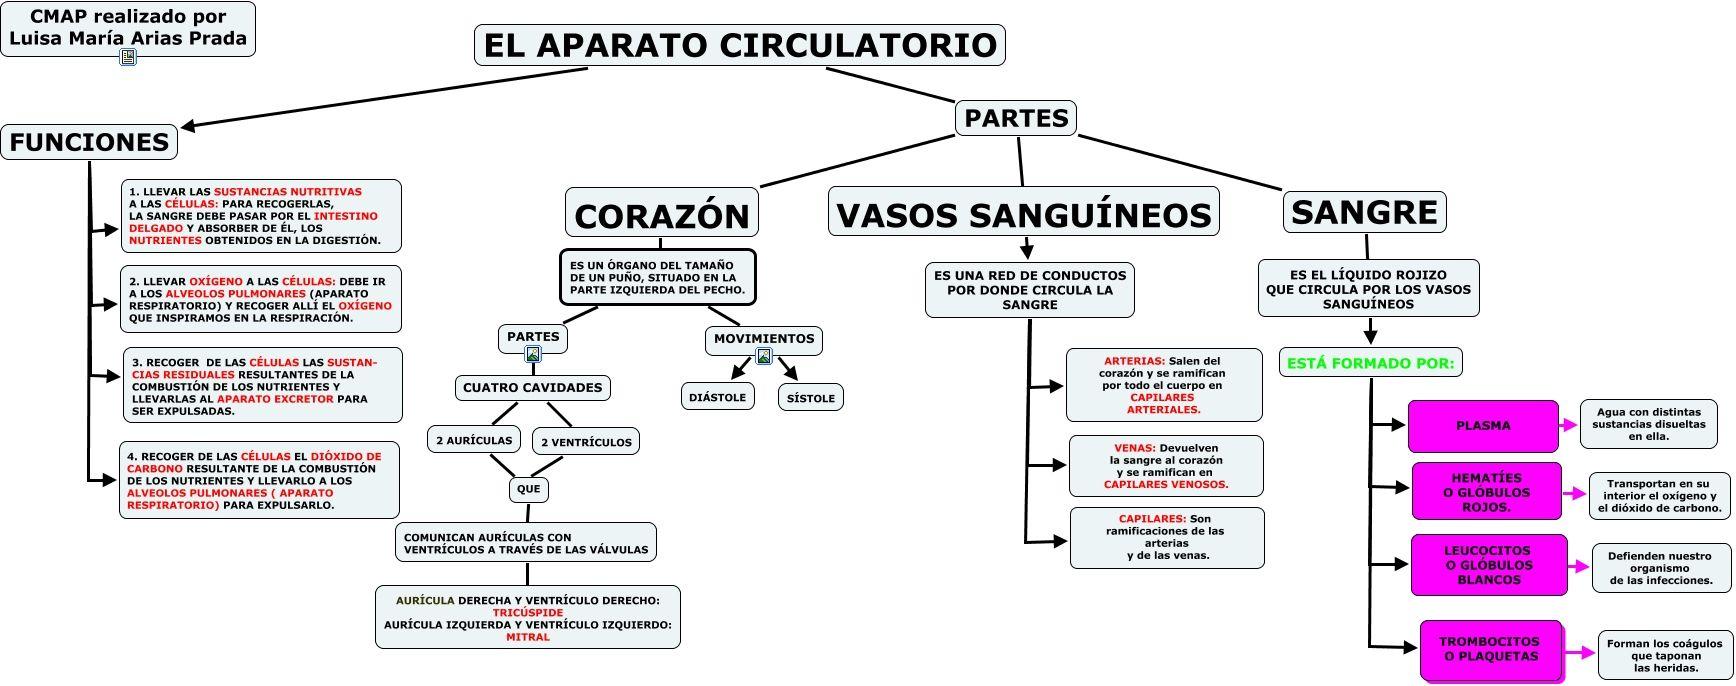 El Sistema Circulatorio Sistema Circulatorio Dibujo Del Aparato Circulatorio Aparato Circulatorio